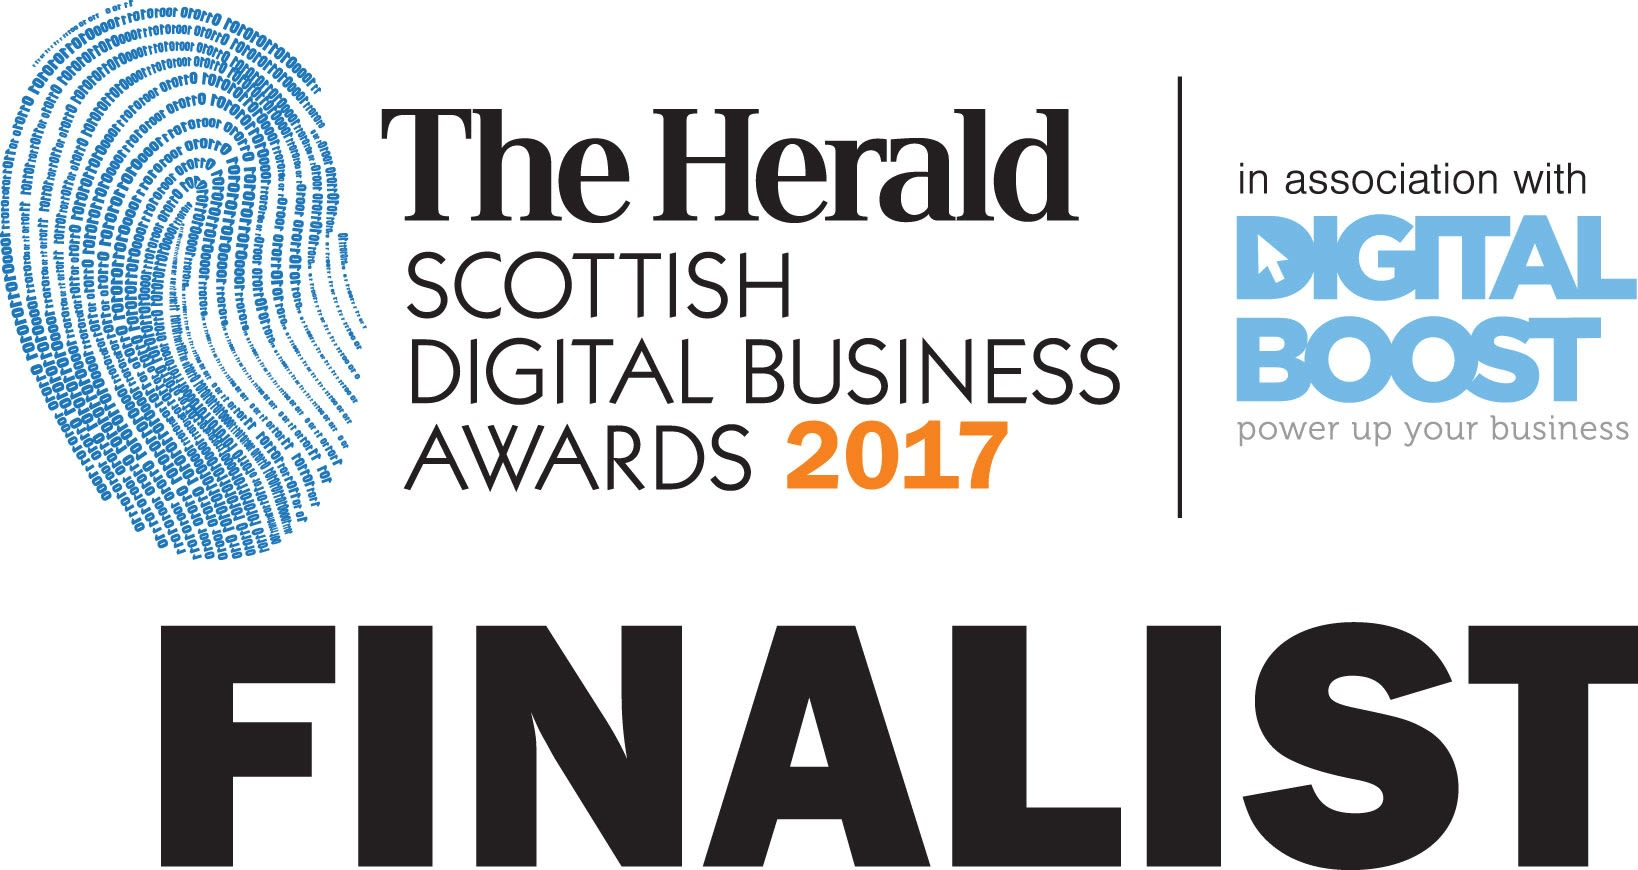 The Herald Scottish Digital Business Awards Finalist 2017